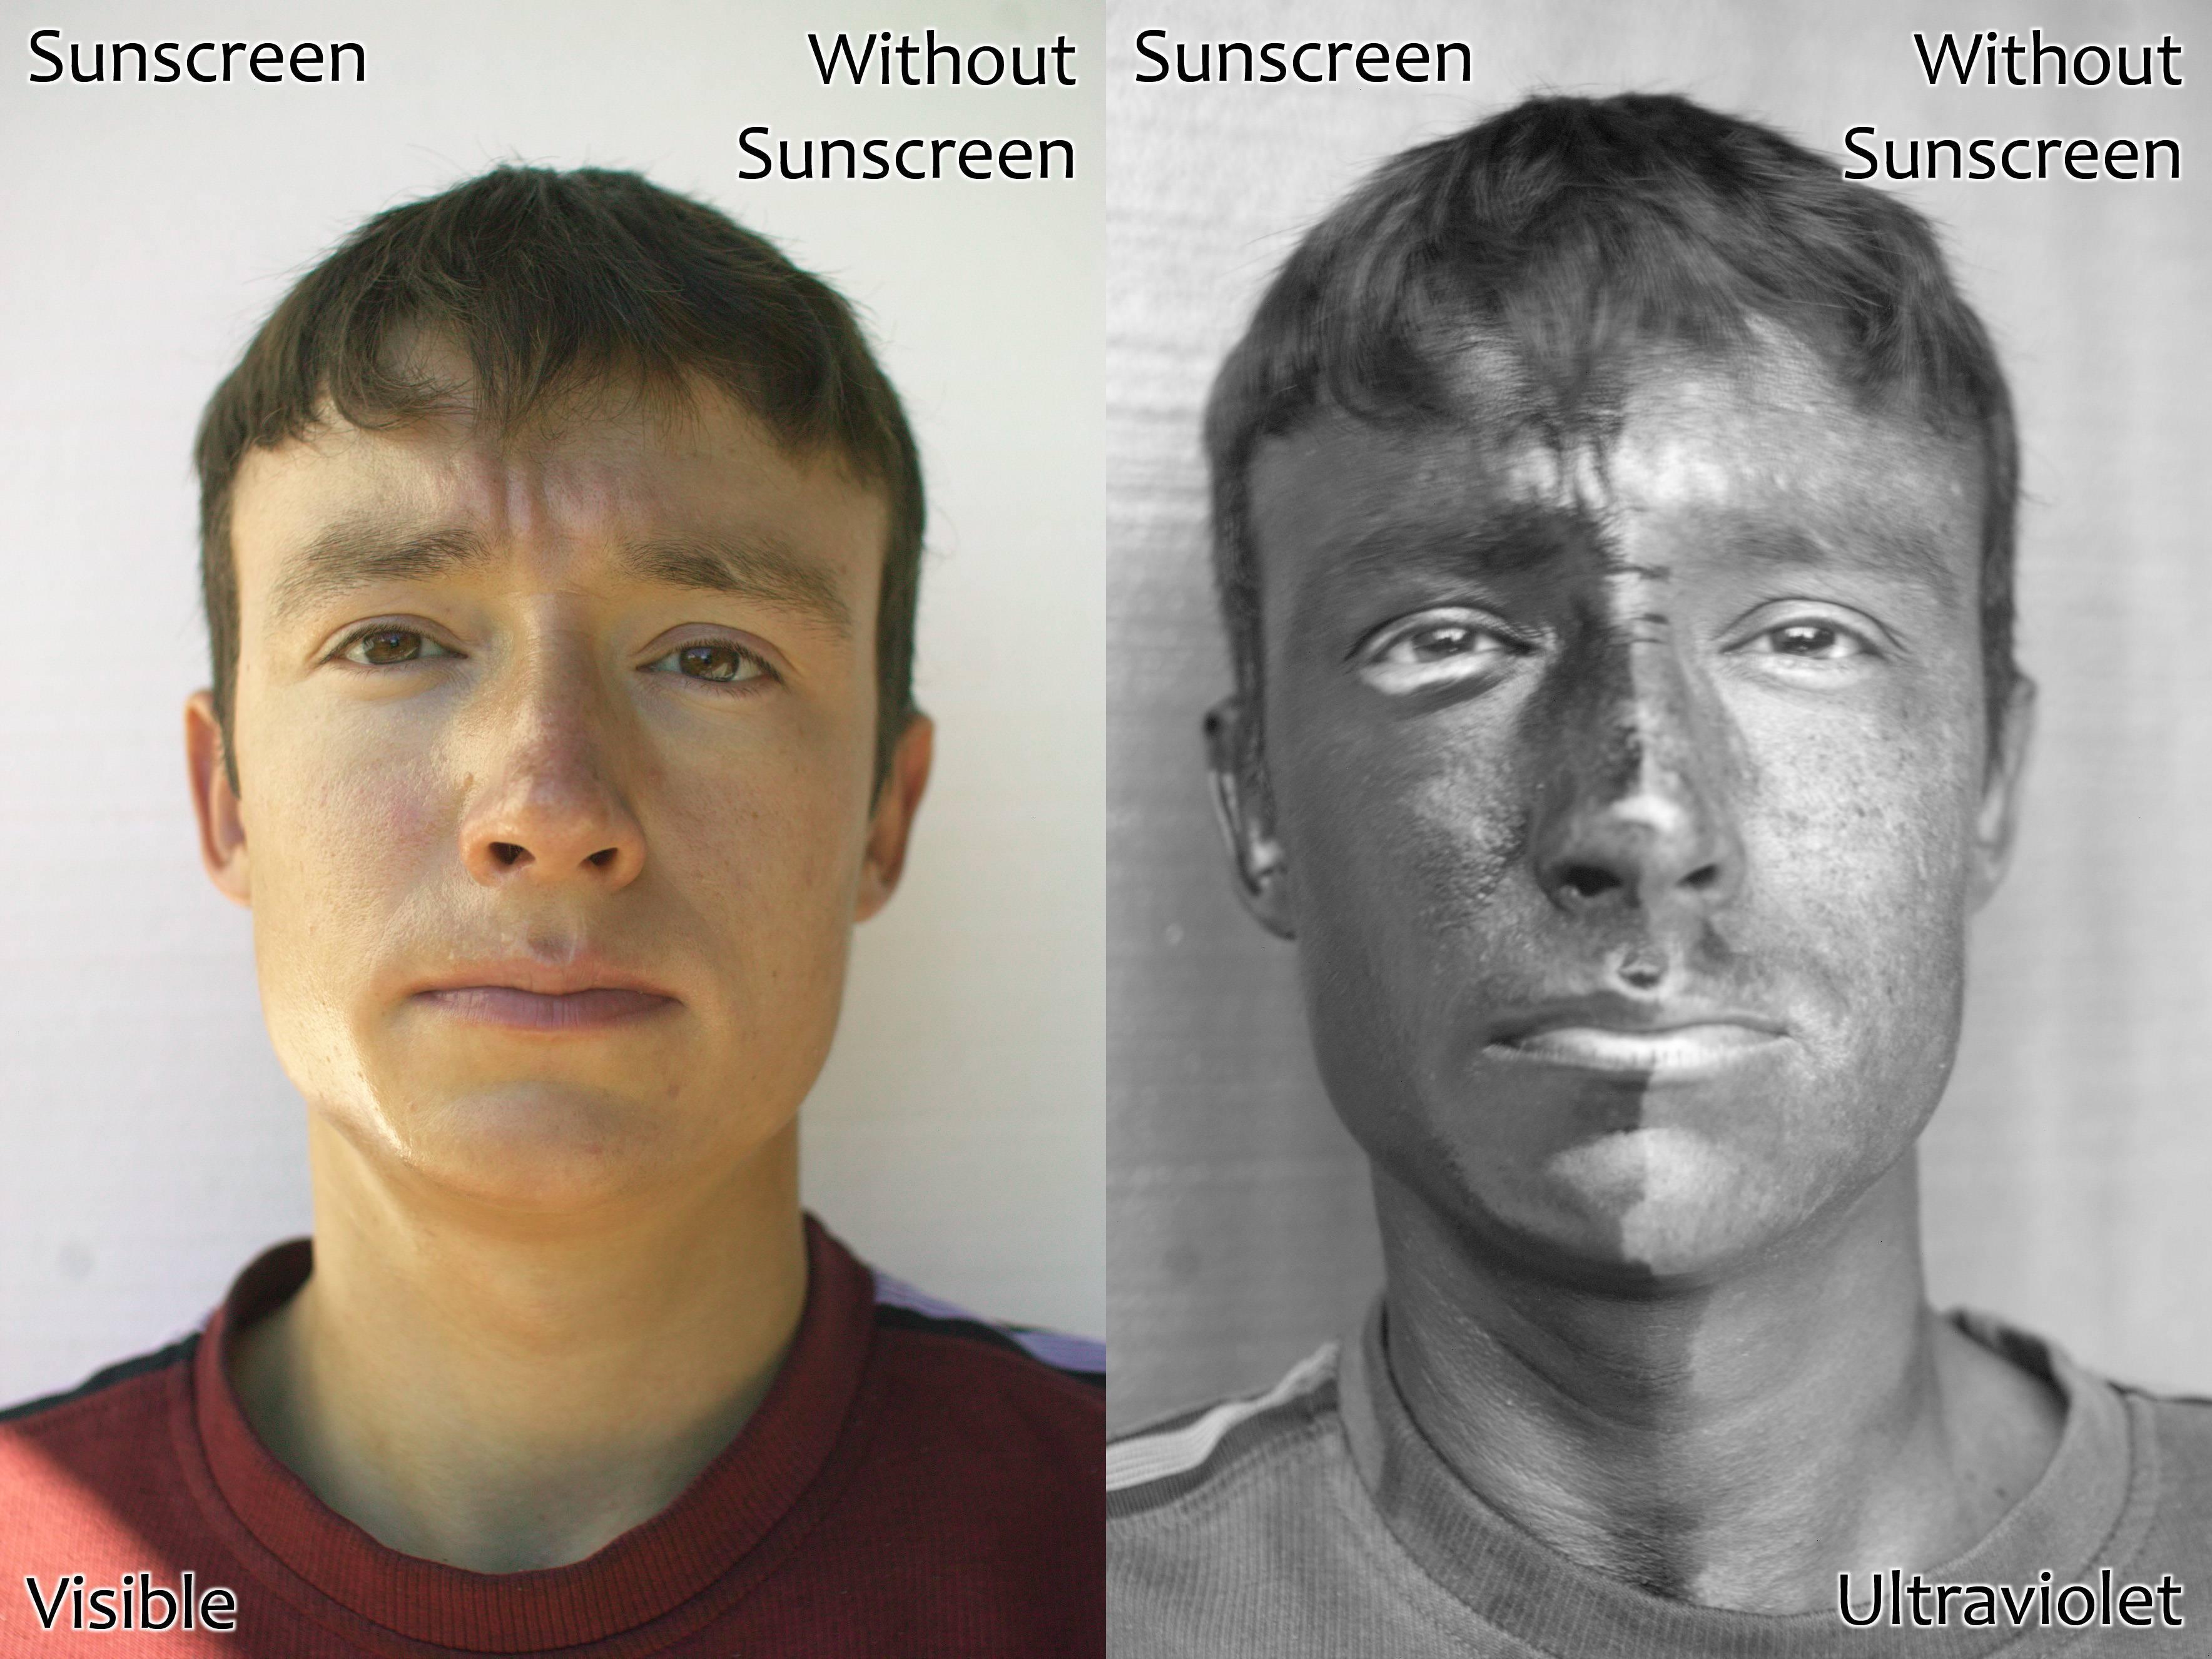 UV and Vis Sunscreen